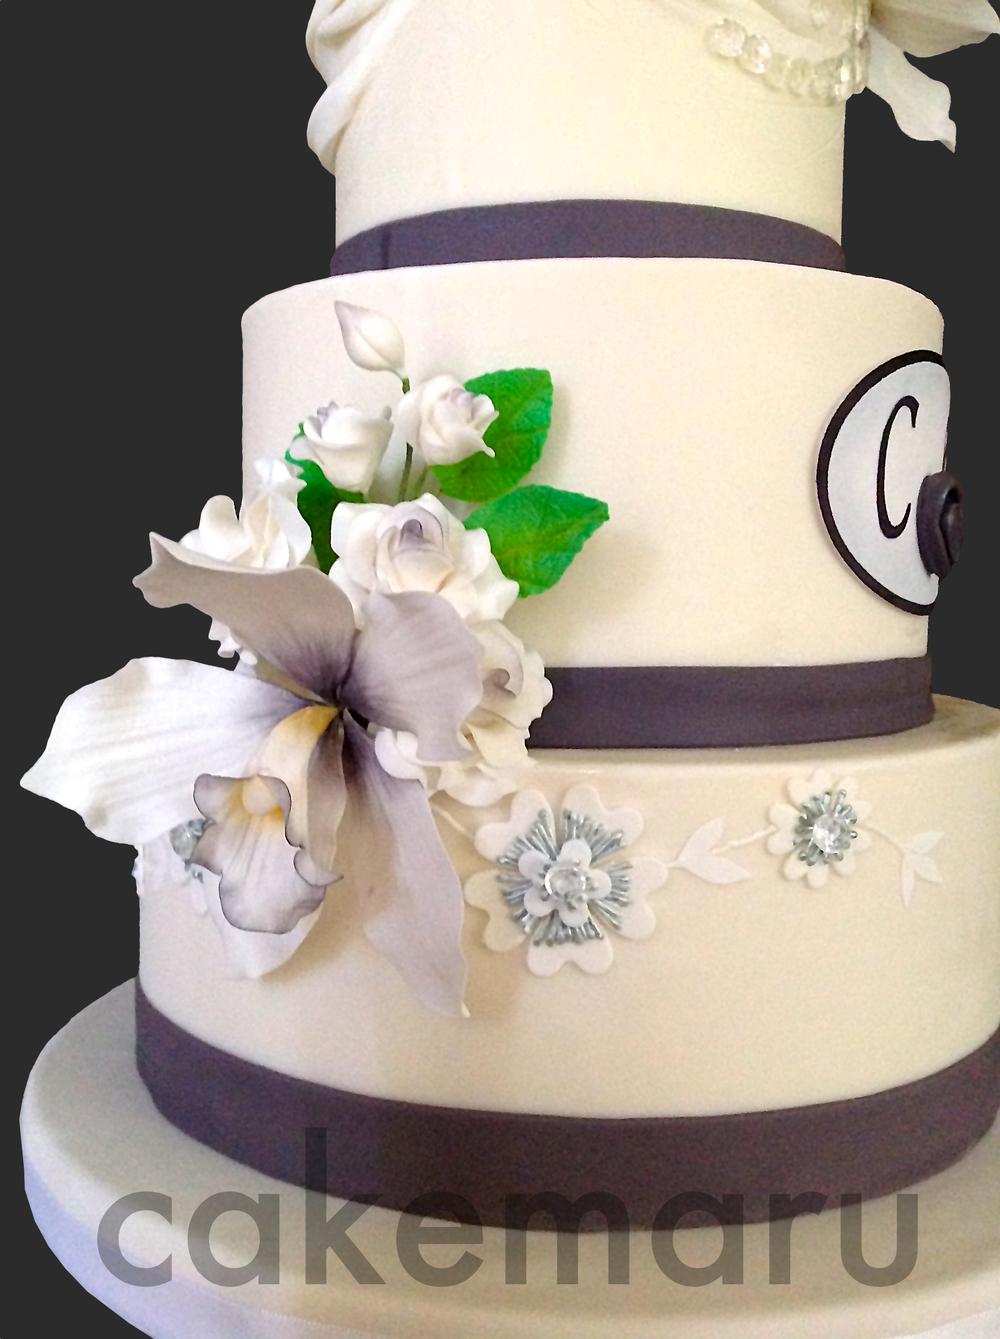 C&R Wedding Cake with name.jpg